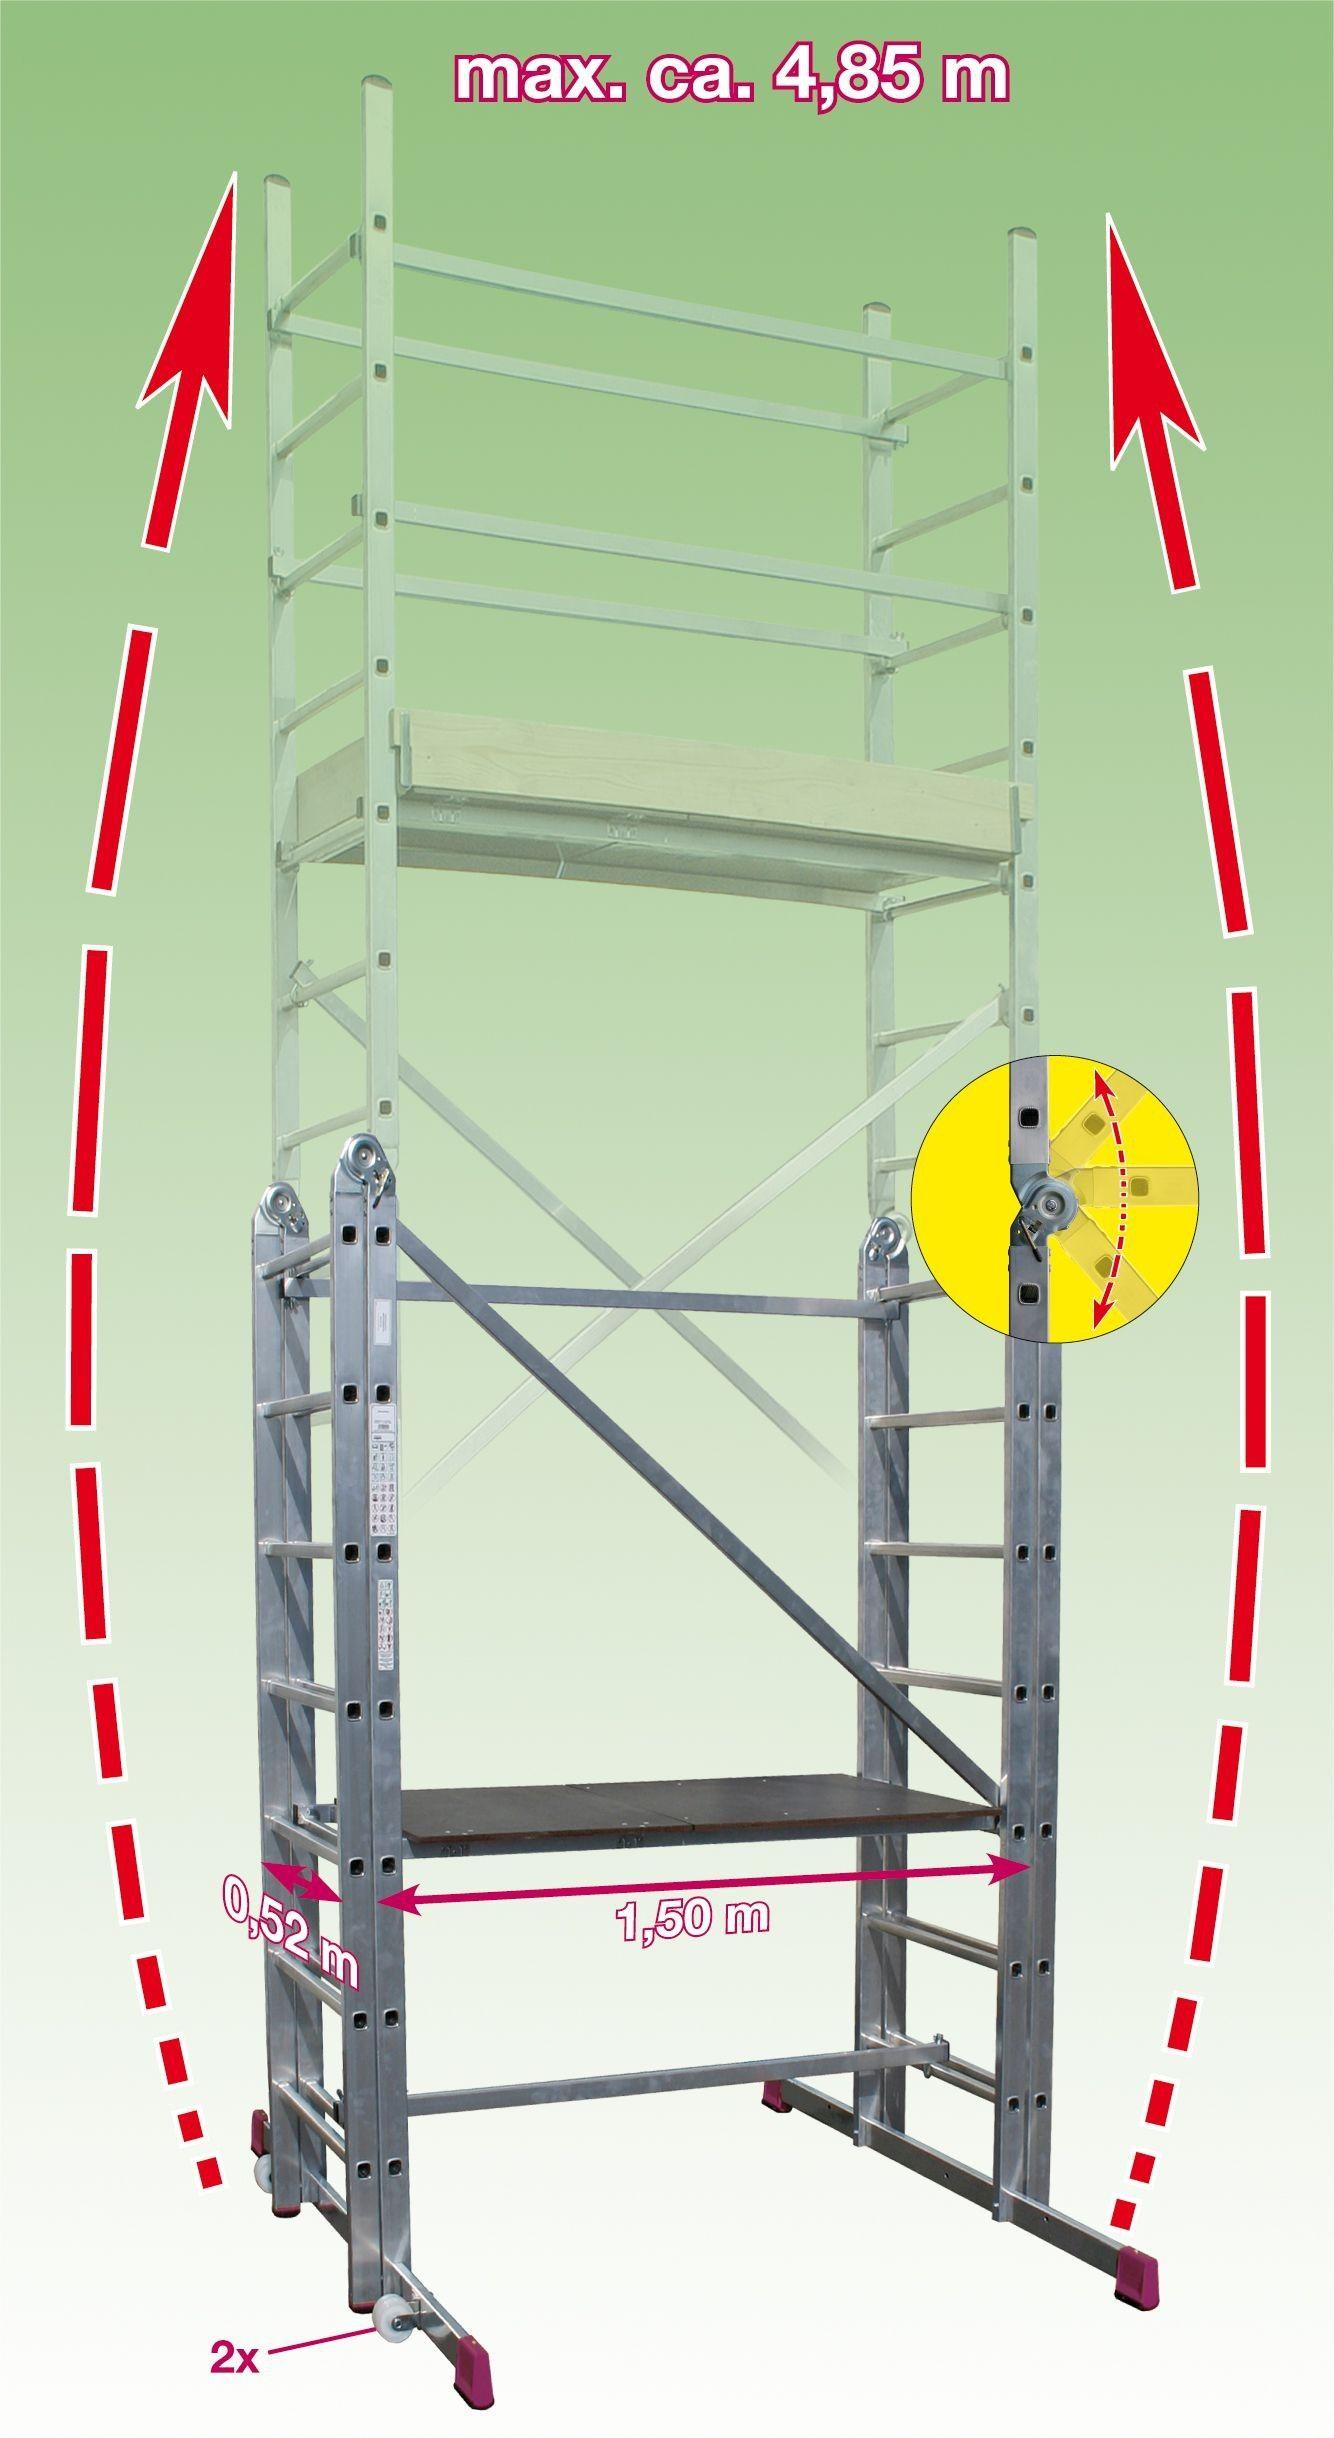 Slika KRAUSE CORDA SKELA VIŠENAMJENSKA MAX.RADNA VISINA 4,85 m NOSIVOST 150 kg